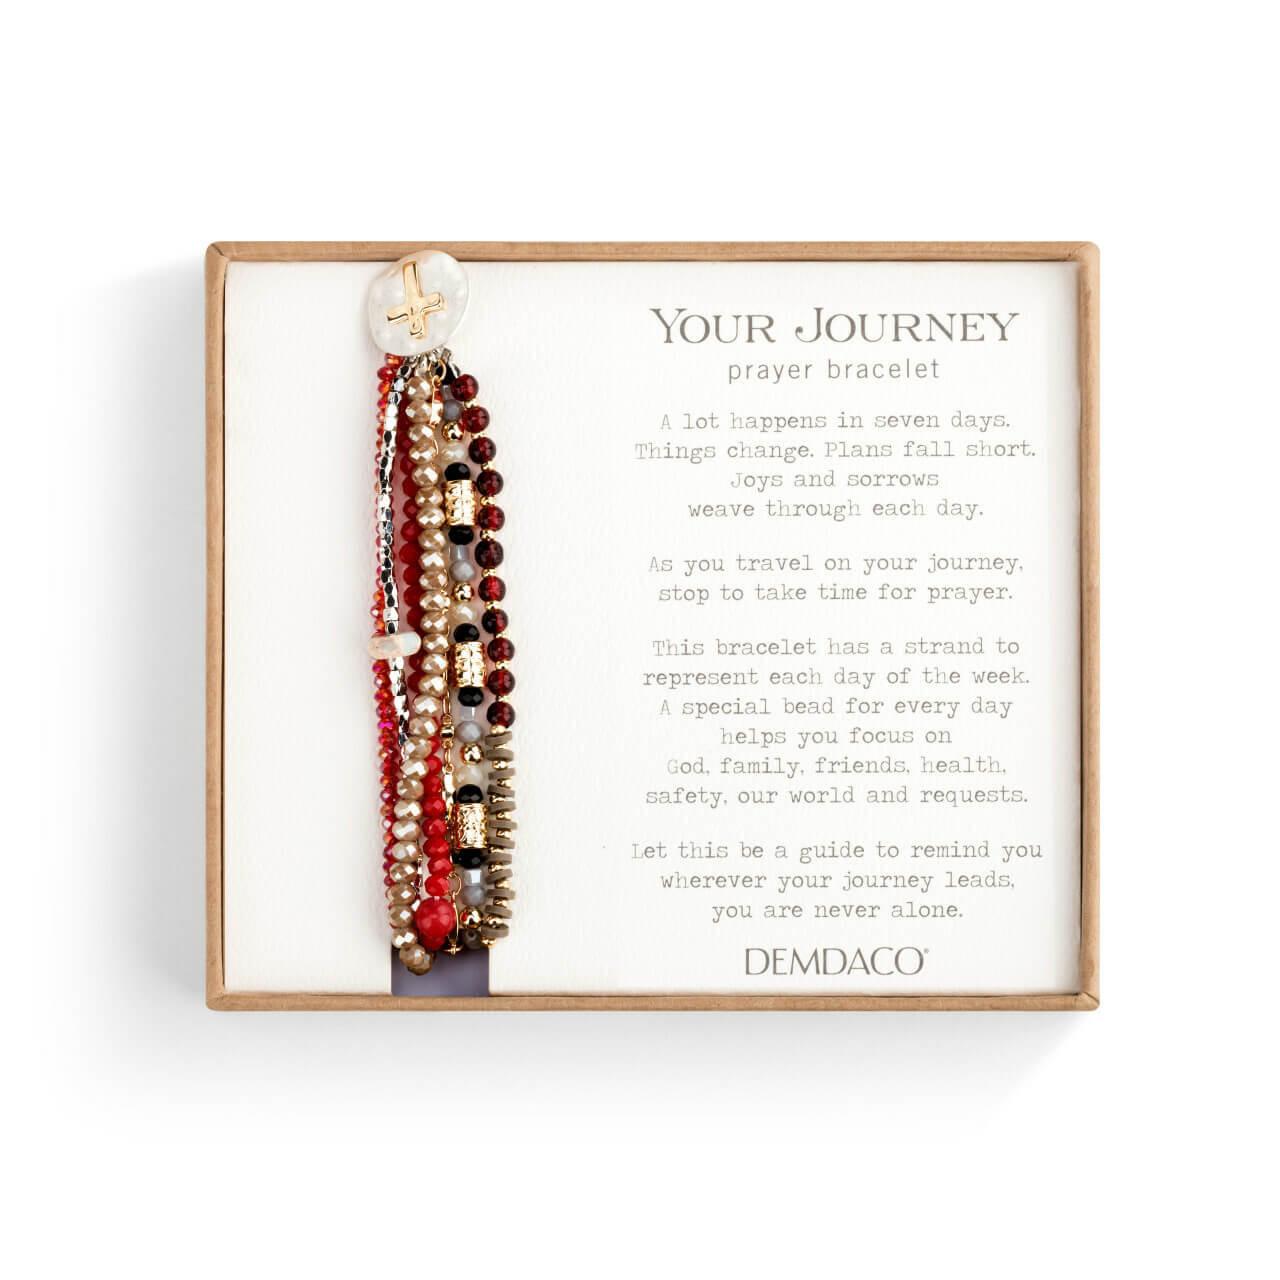 A lot happens in seven days prayer bracelet garnet